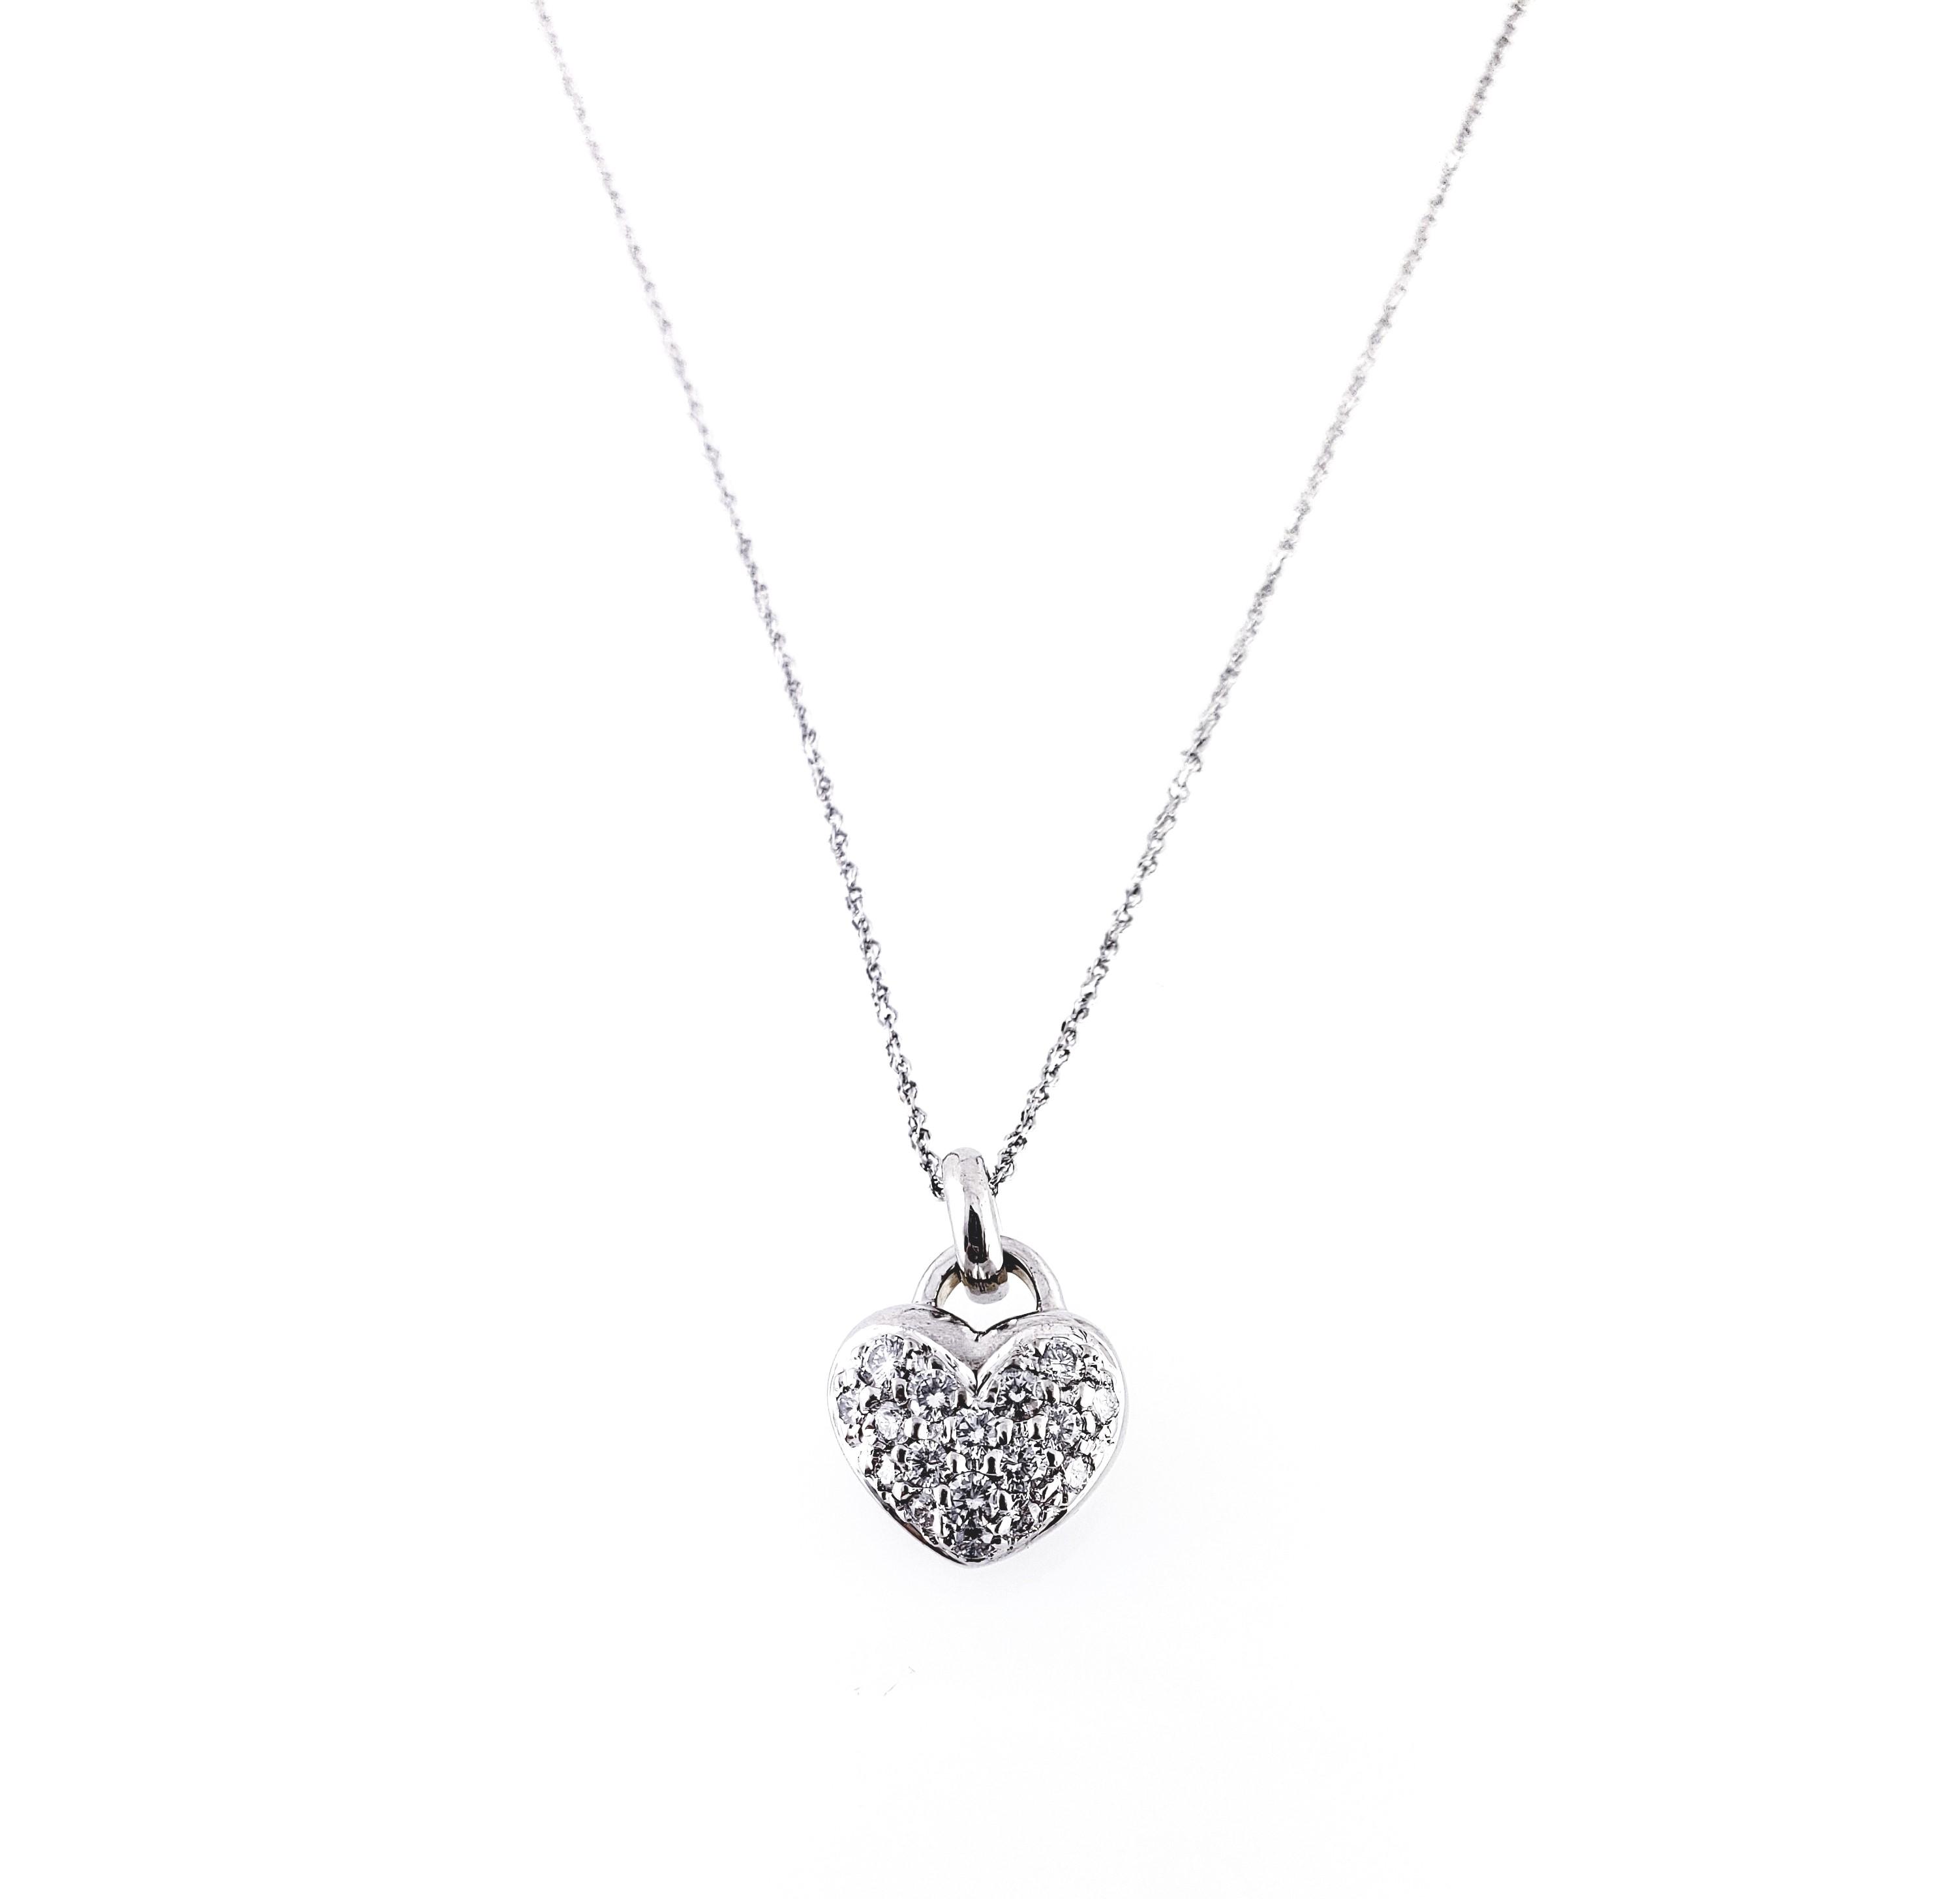 5d00ebda3ab4f Necklace - Heart Puff Charm Diamond